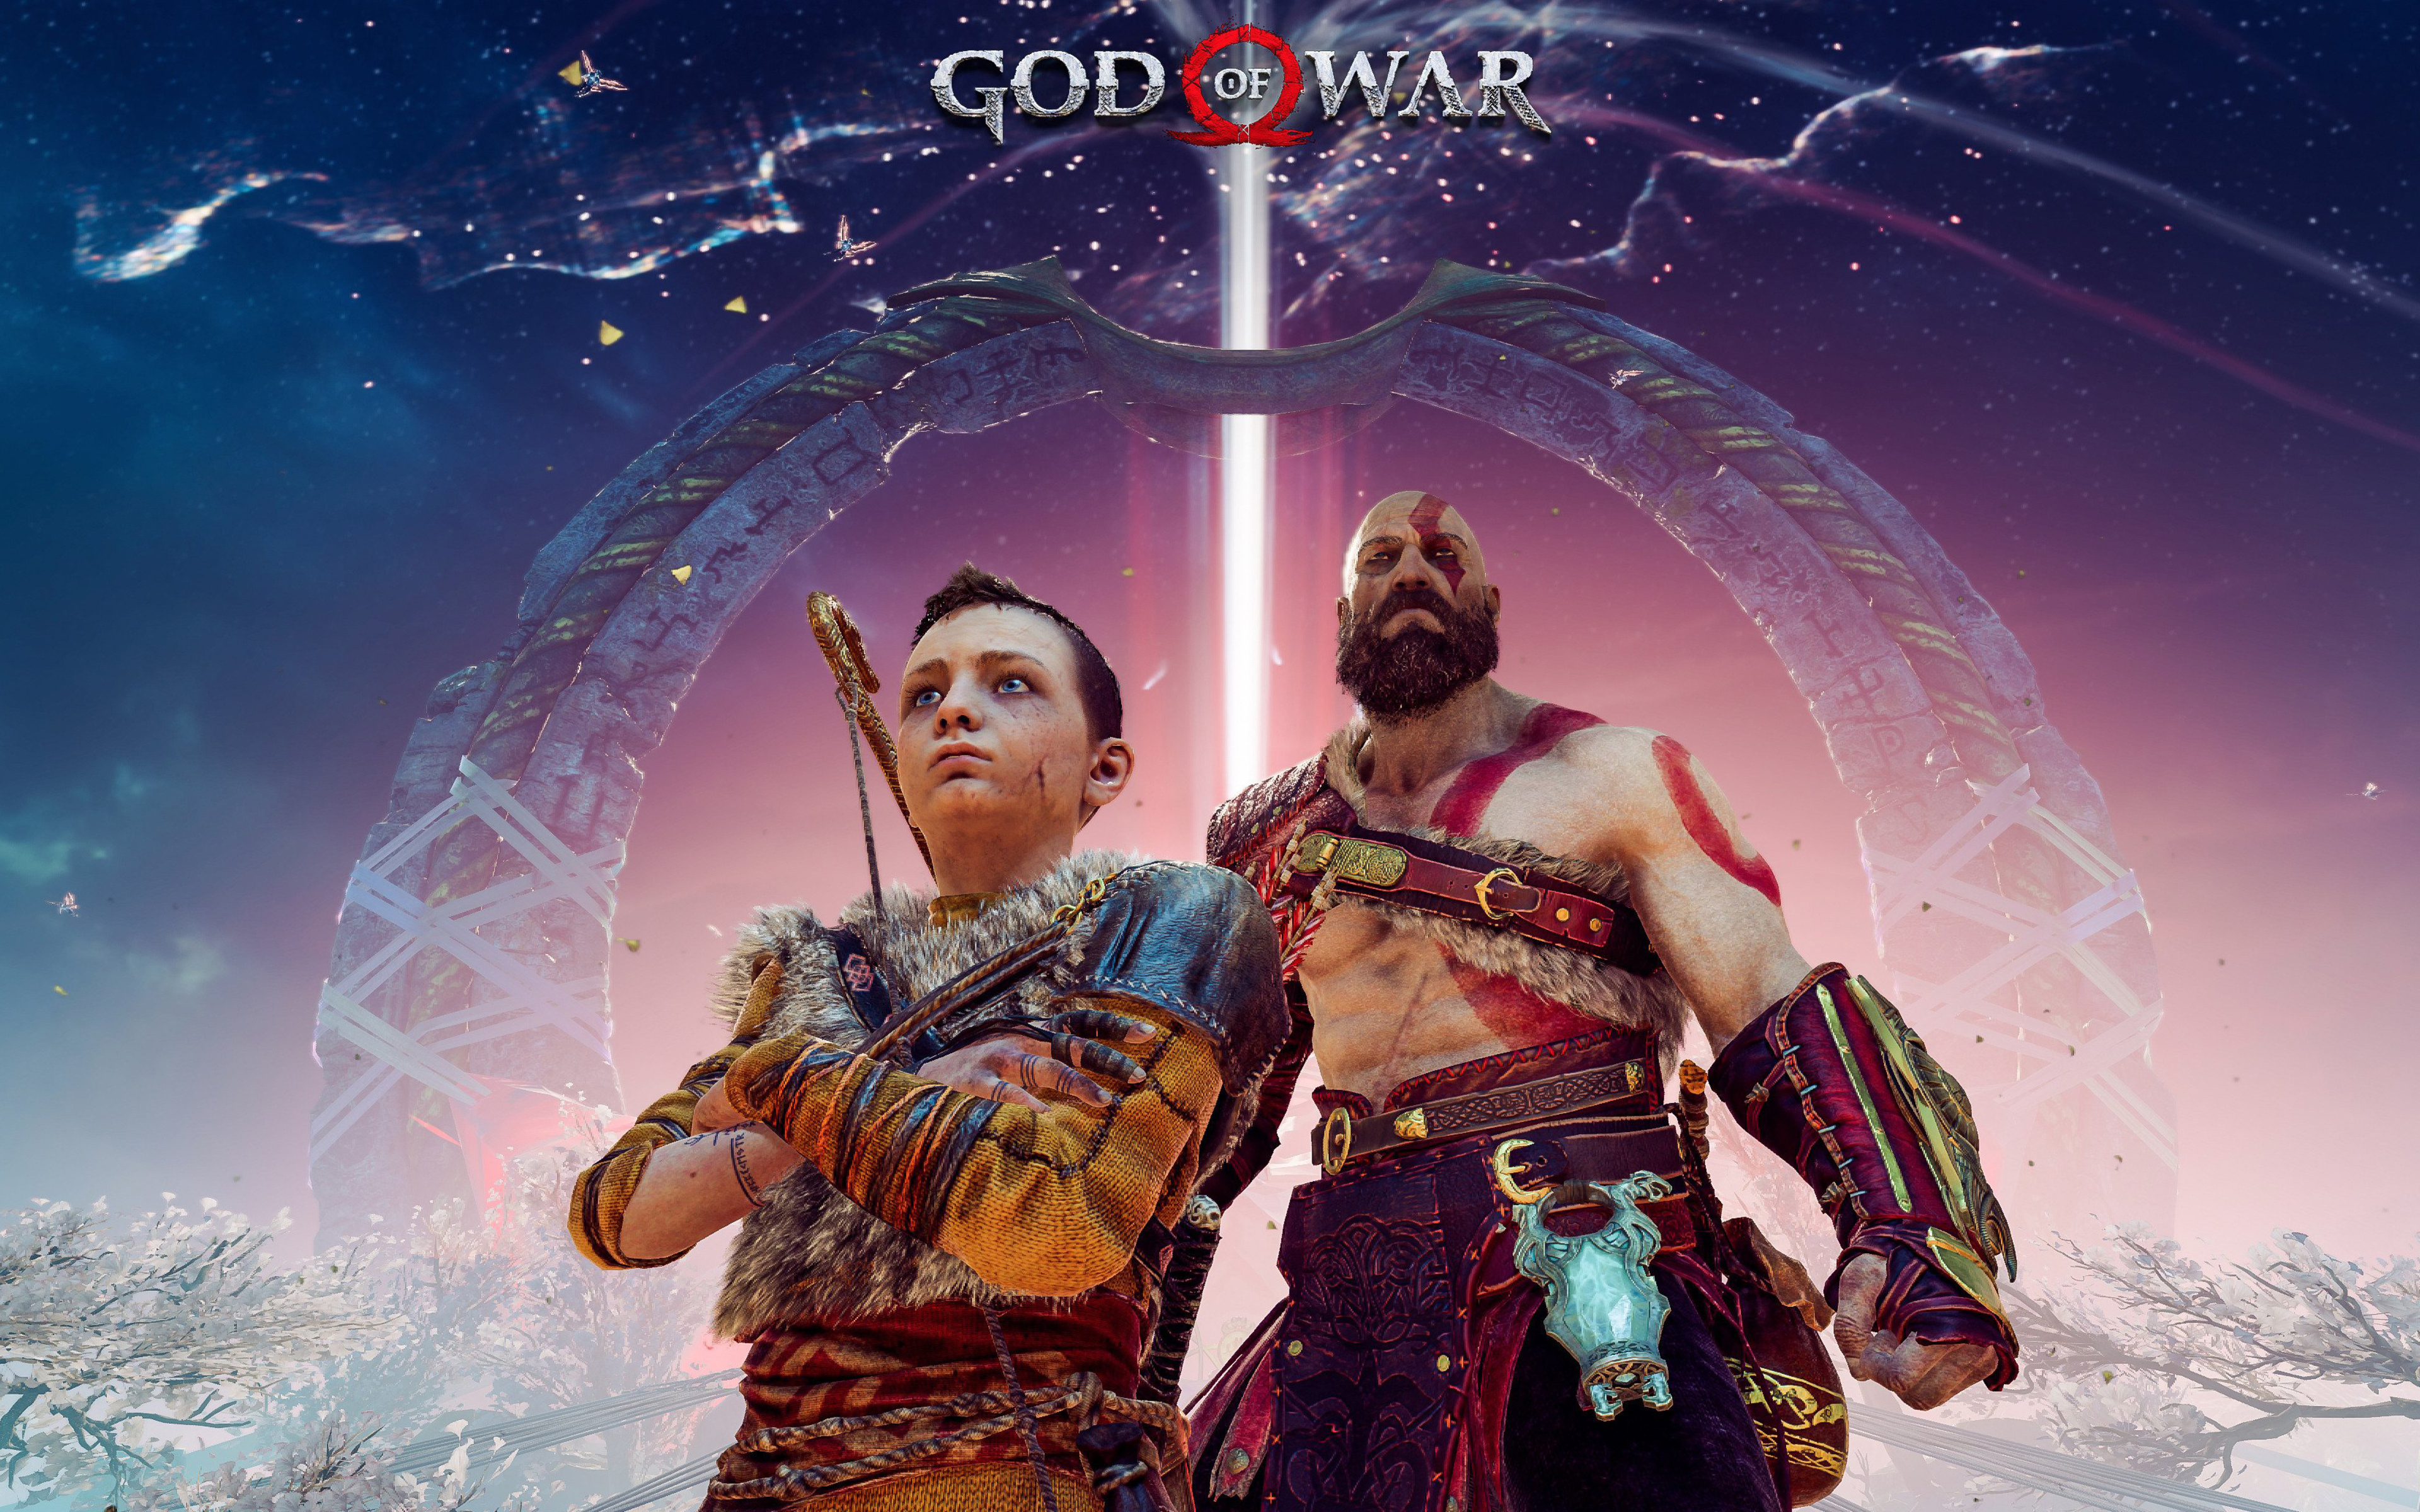 3840x2400 God Of War 4 Fanart 4k 4k Hd 4k Wallpapers Images